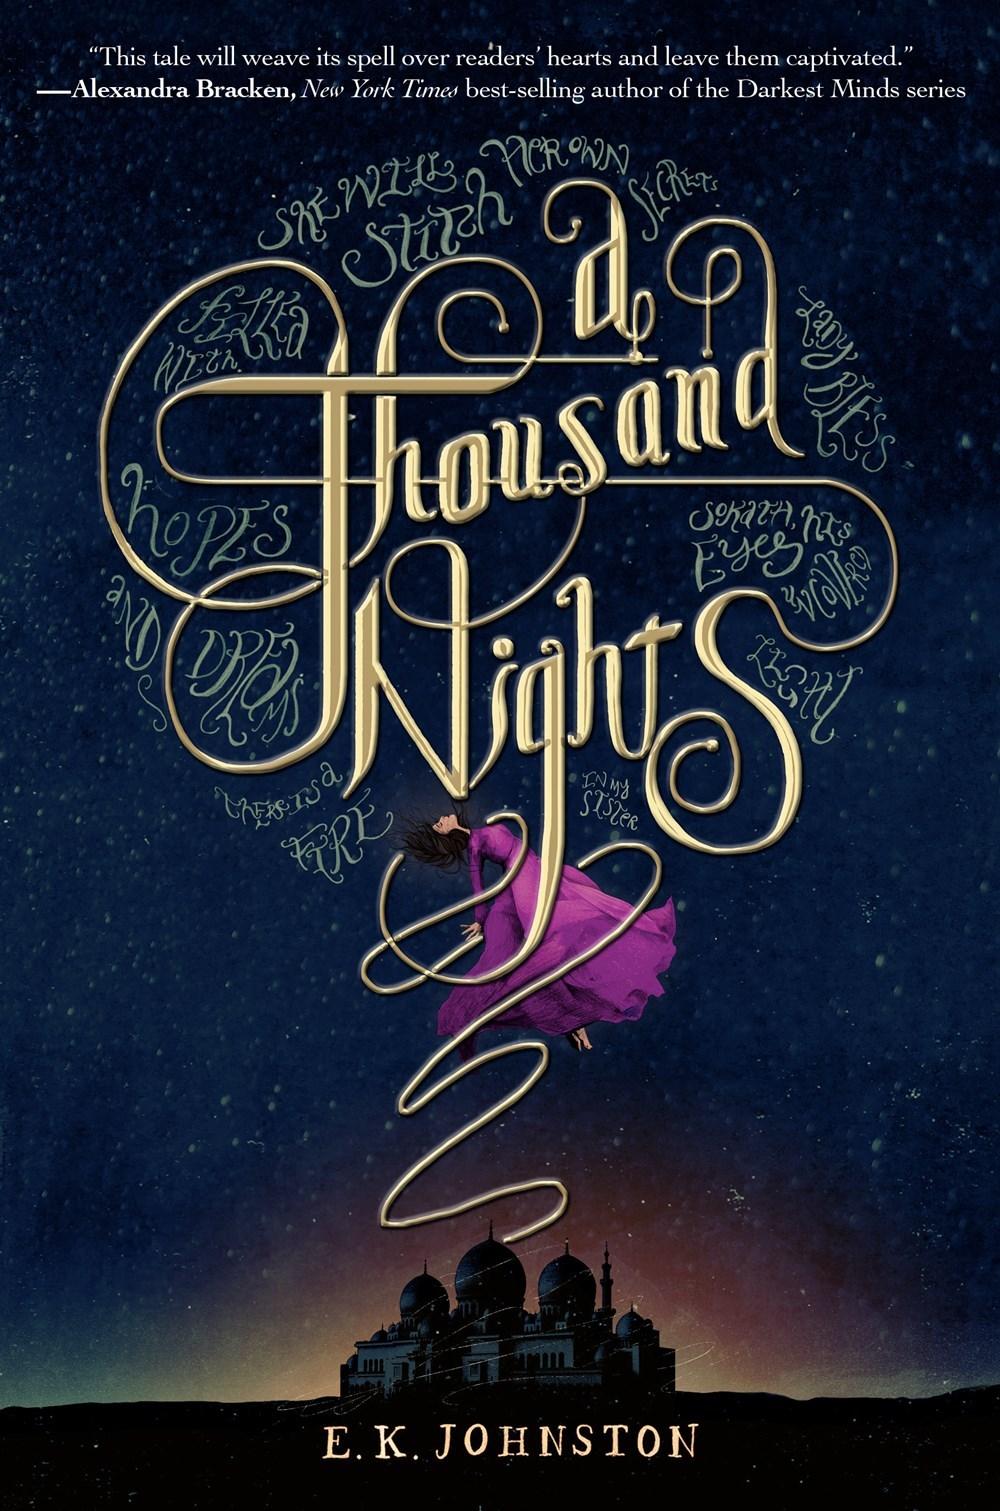 A Thousand Nights (A Thousand Nights, #1) By E.K. Johnston